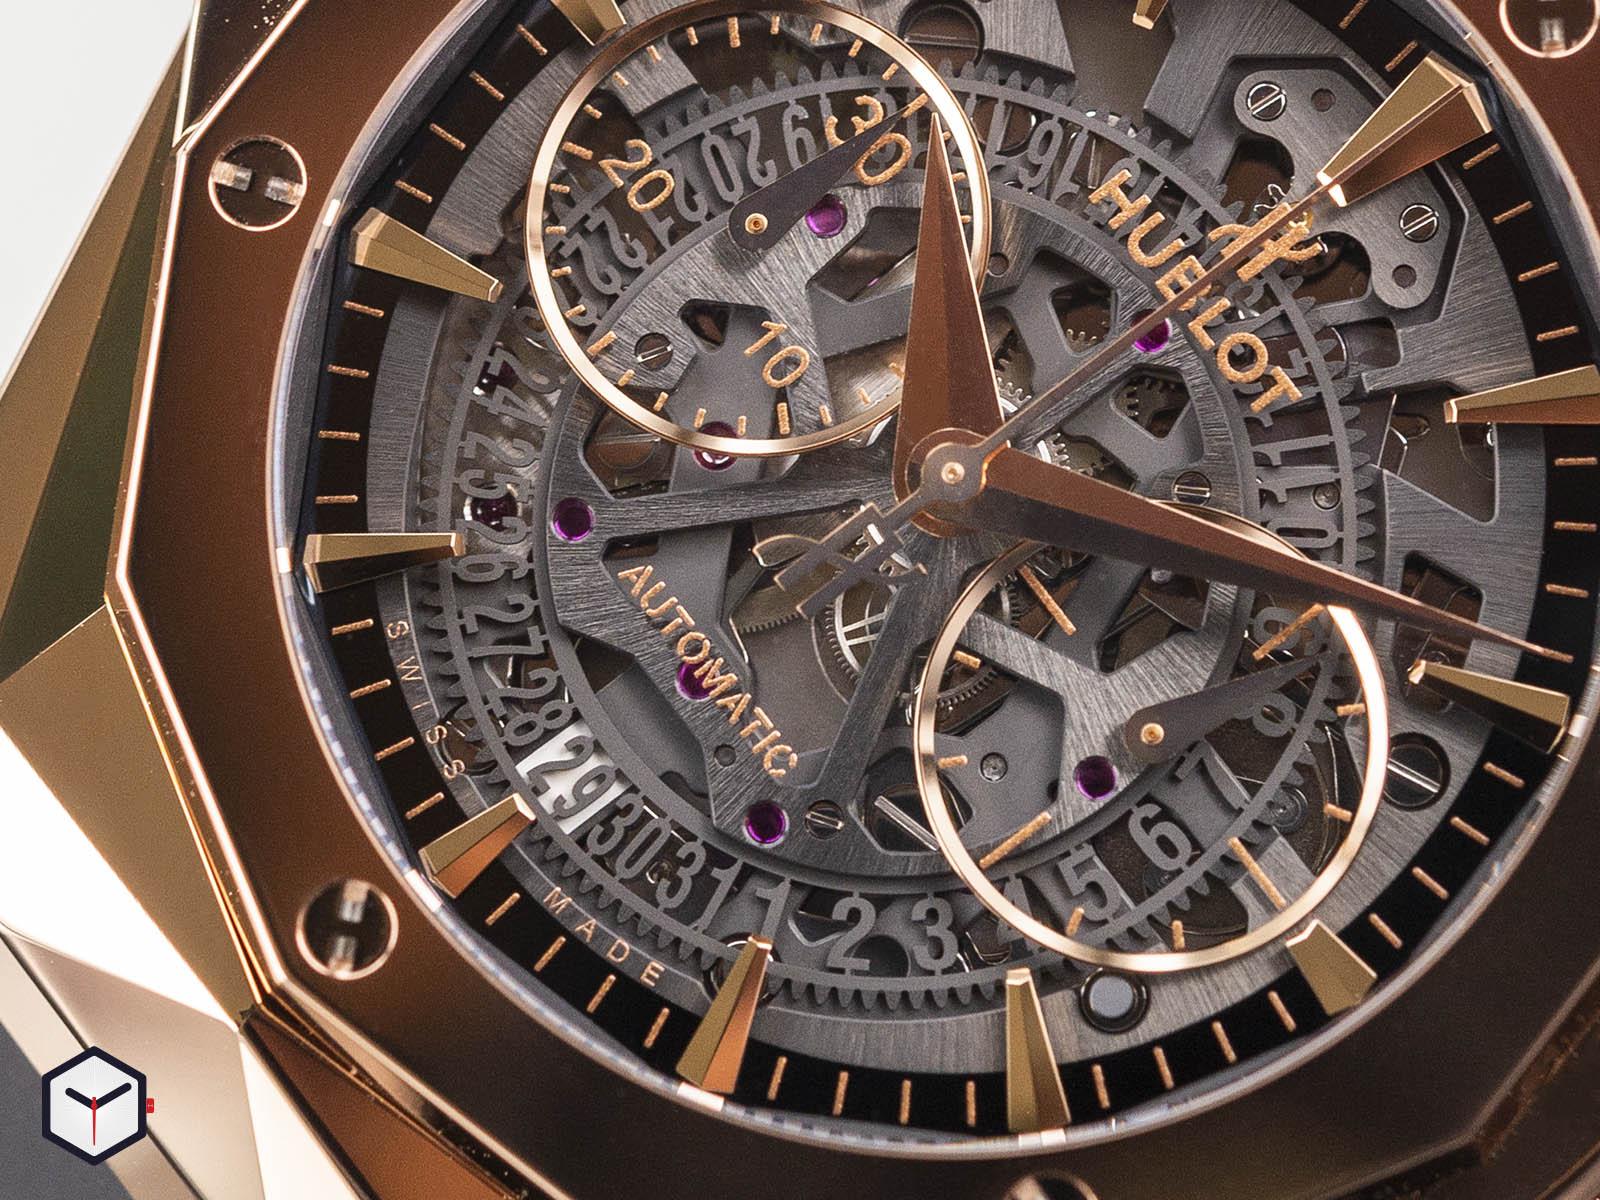 525-ox-0180-rx-orl18-hublot-classic-fusion-aerofusion-chronograph-orlinski-king-gold-3.jpg